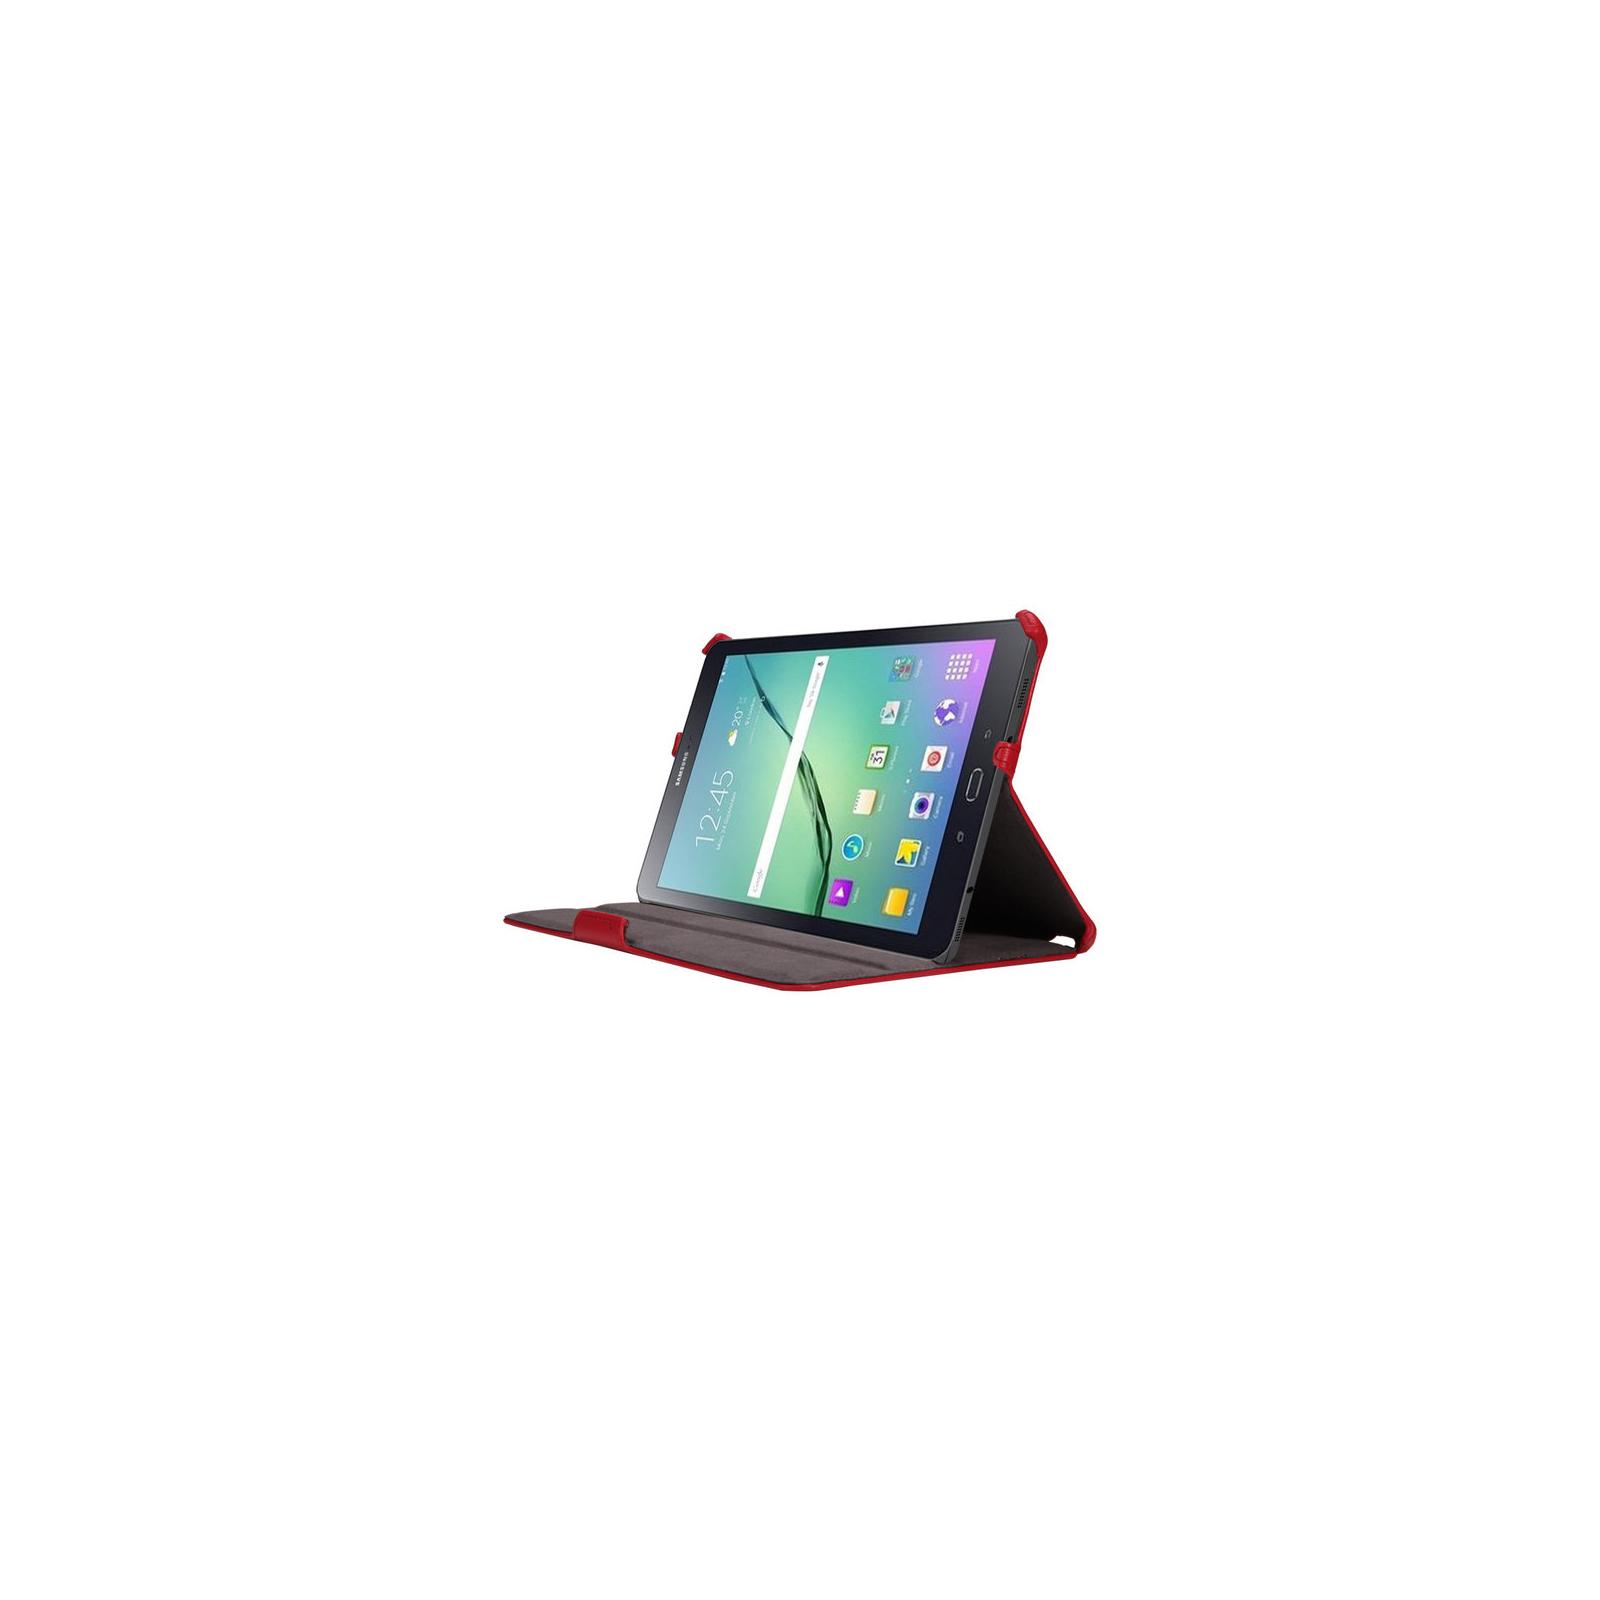 Чехол для планшета AirOn для Samsung Galaxy Tab S 2 8.0 red (4822352777524) изображение 5